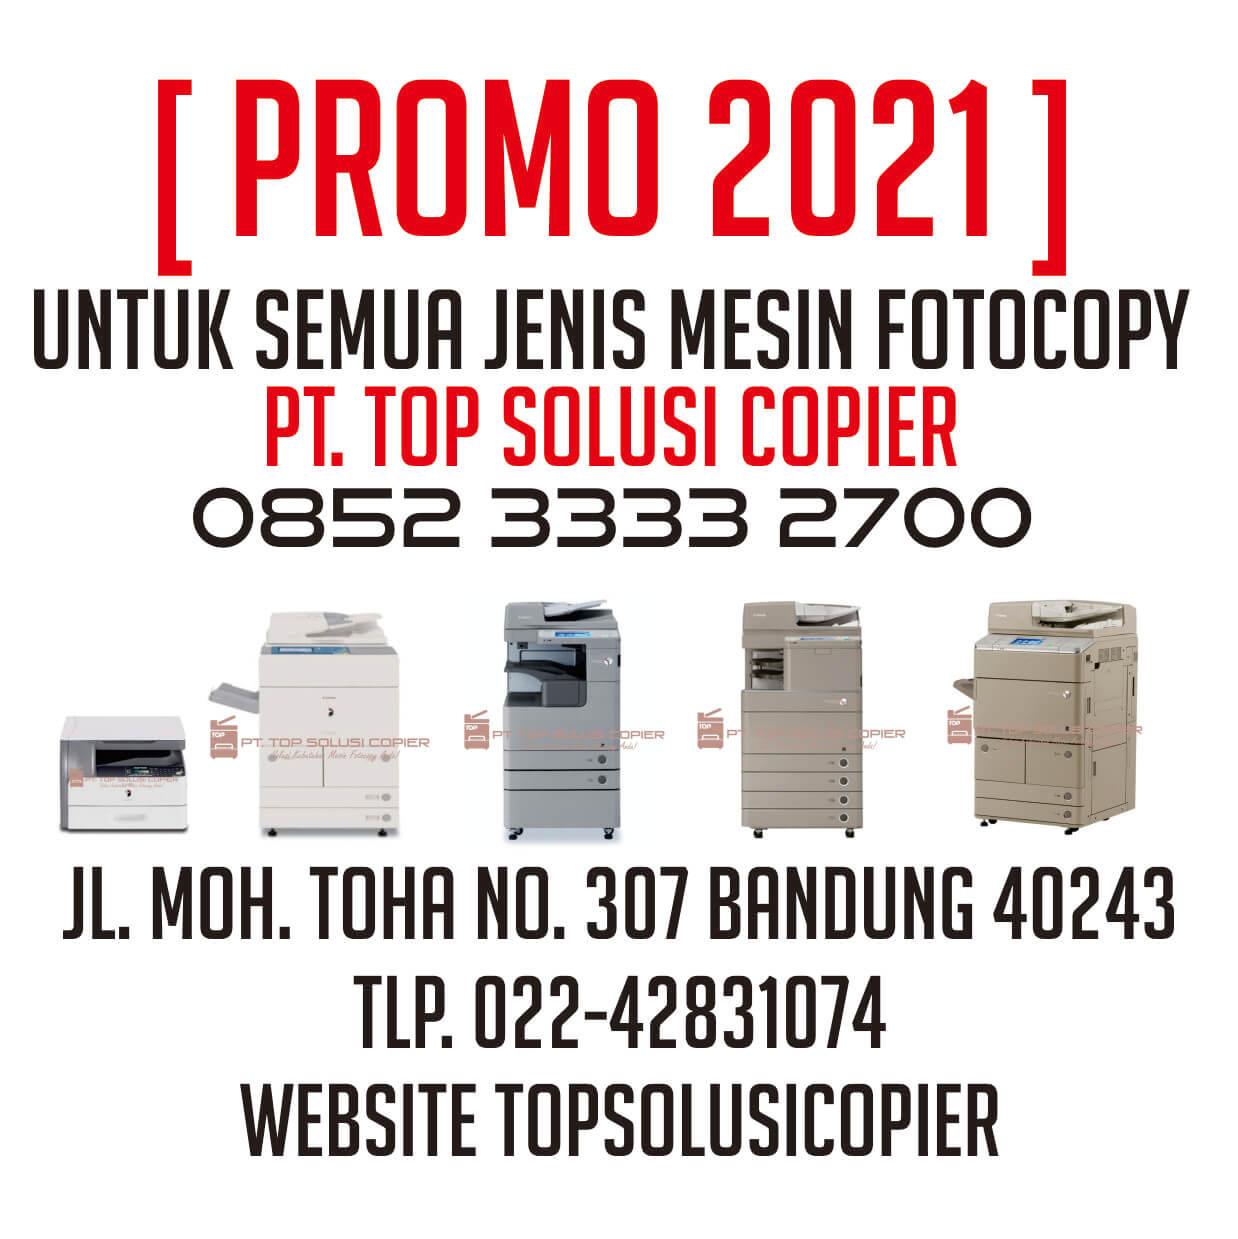 MESIN FOTOCOPY SUKABUMI TERMURAH PROMO 2021